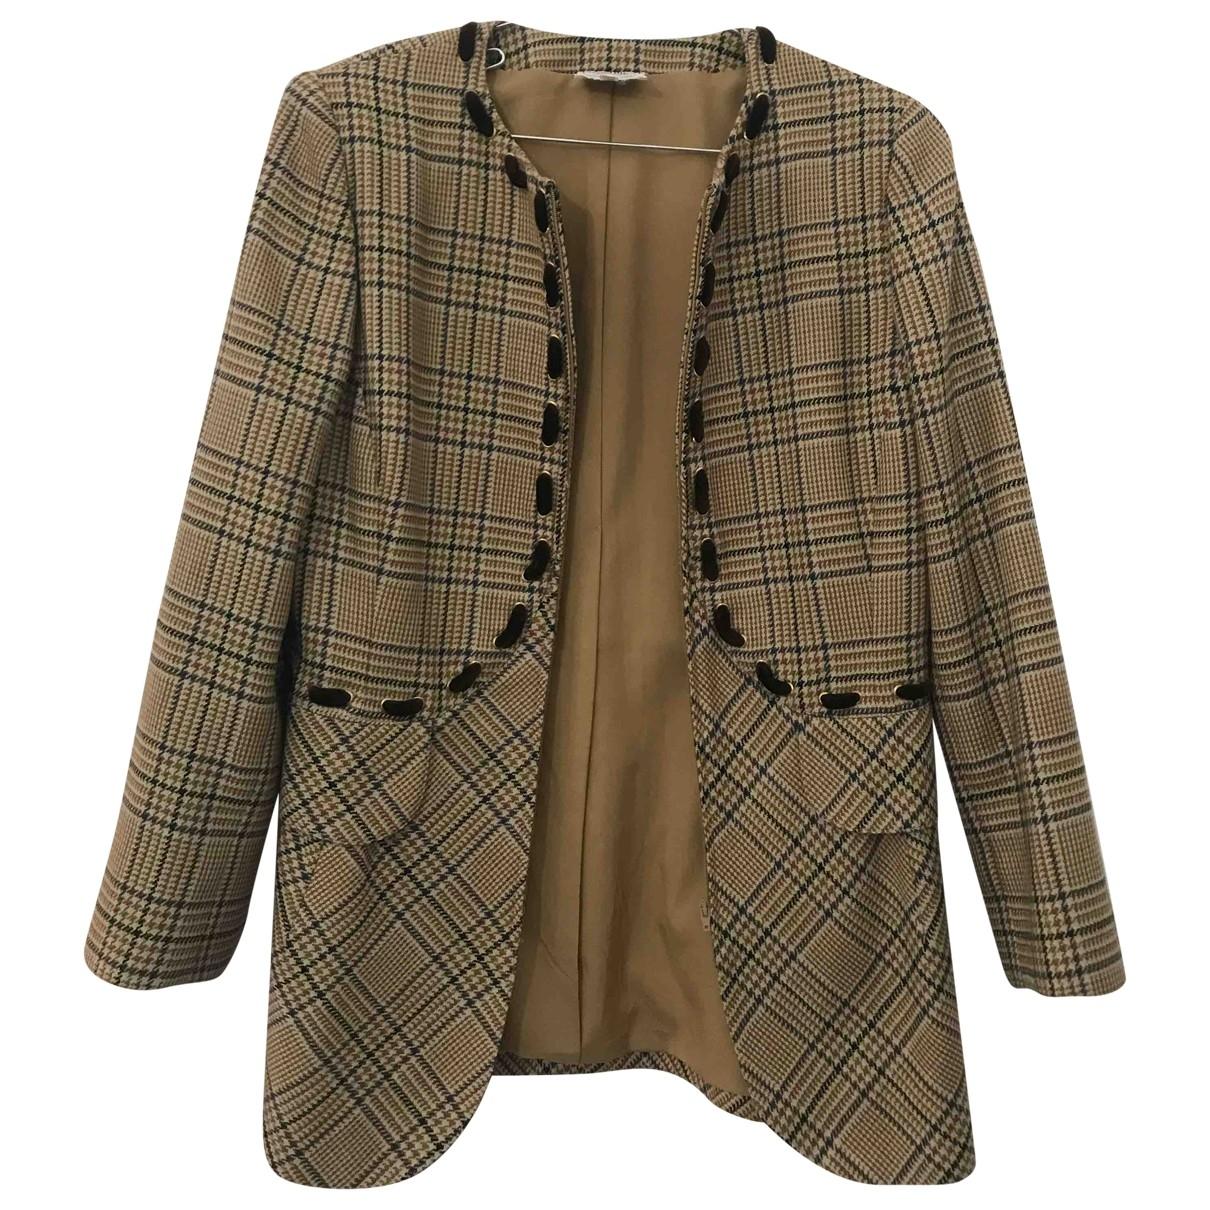 Valentino Garavani \N Multicolour Wool jacket for Women M International